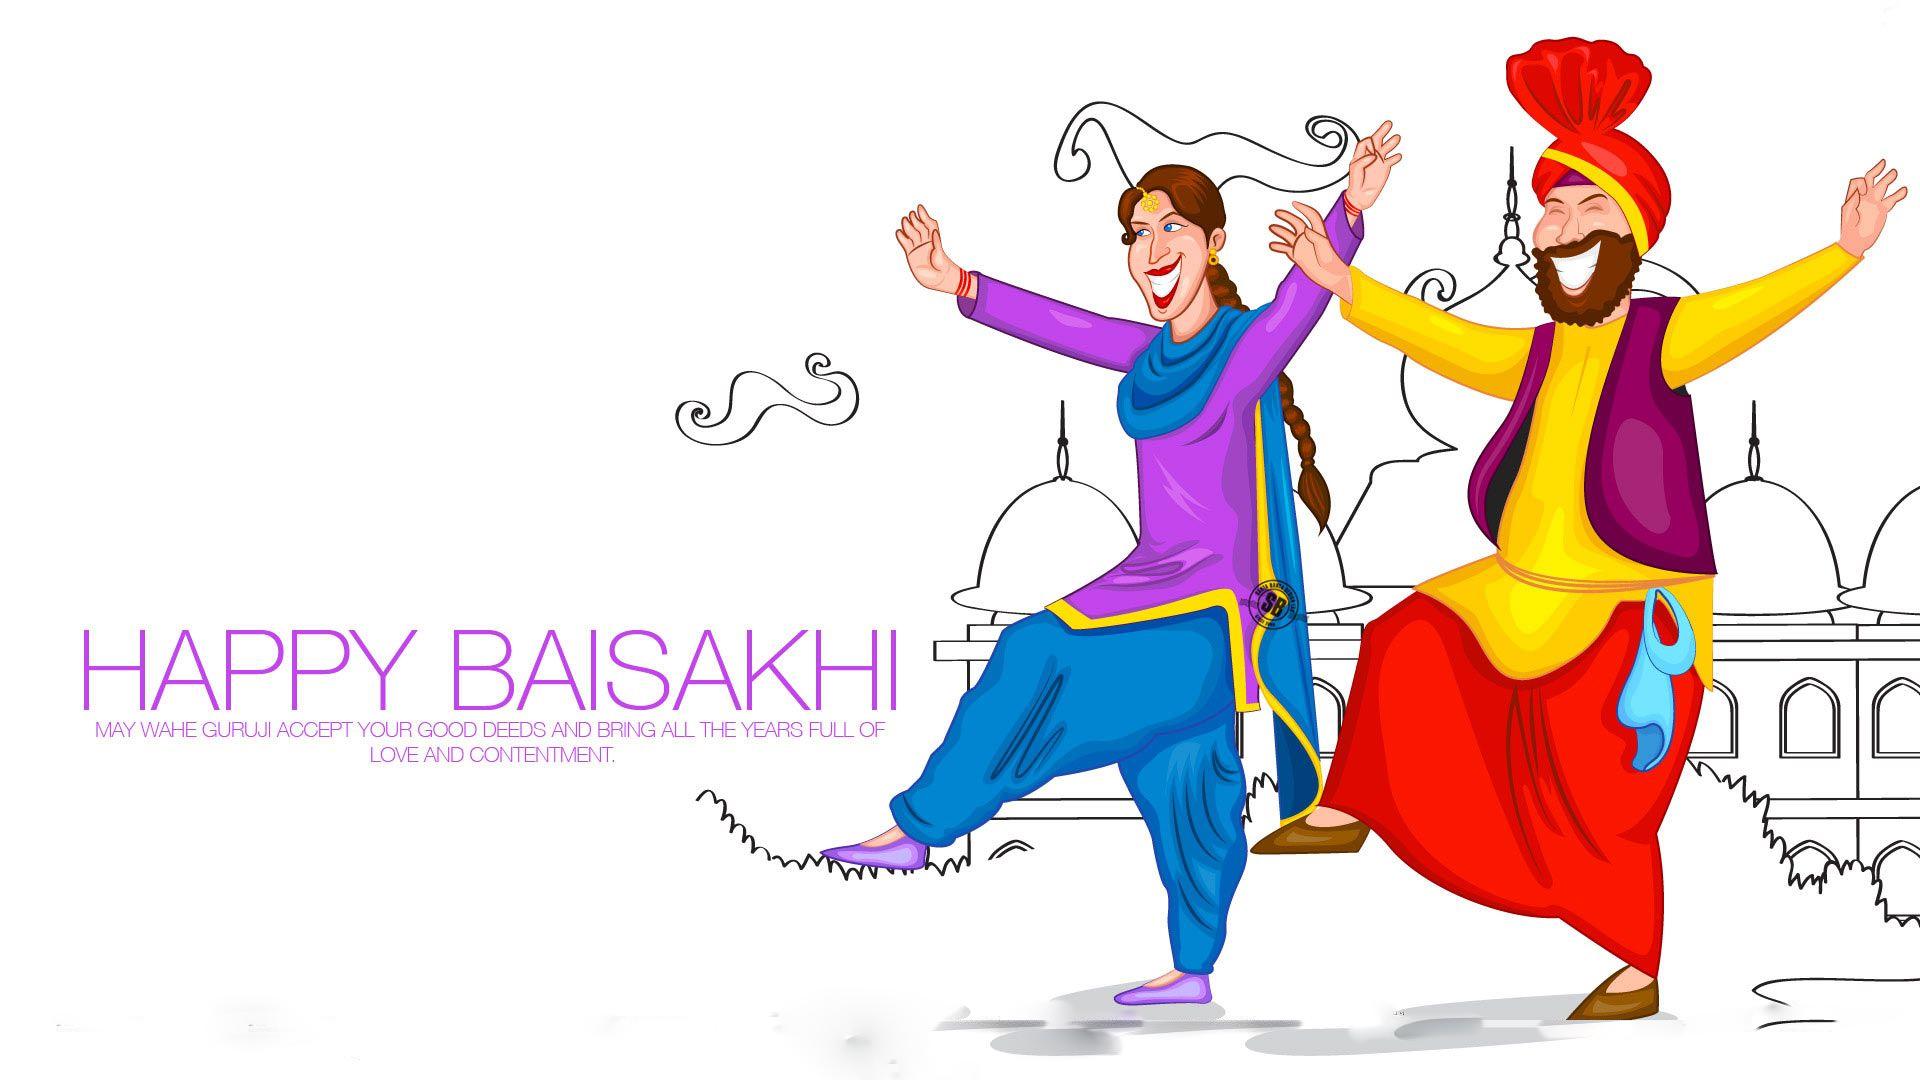 Happy Baisakhi Wallpapers 1080p Download